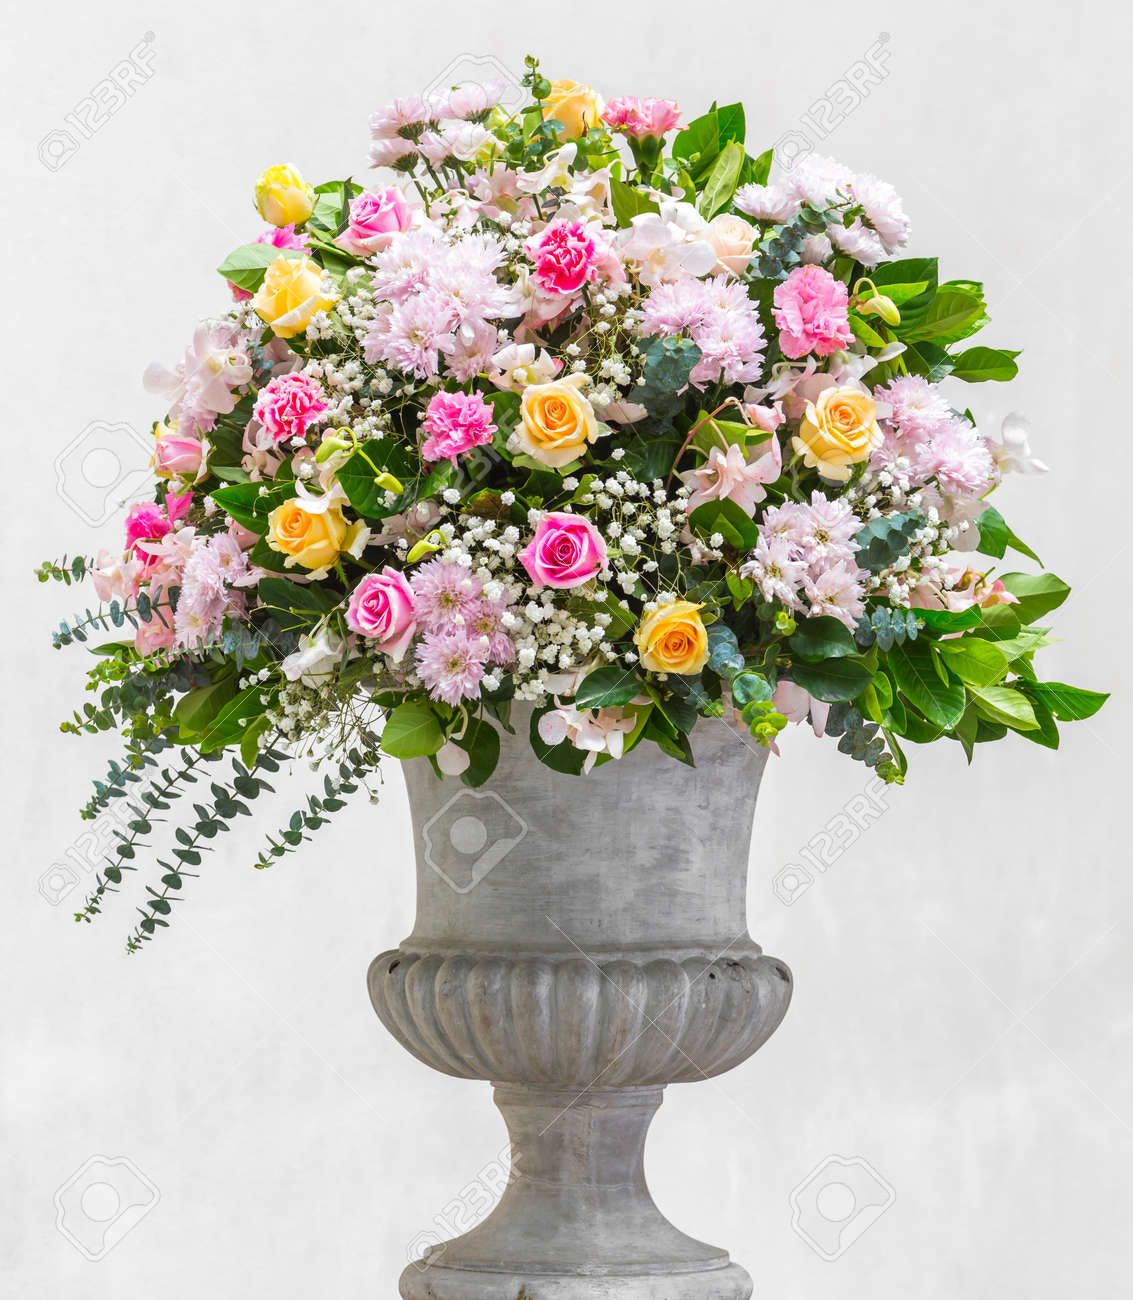 Flower Bouquet Decoration In Grunge Concrete Vase Stock Photo